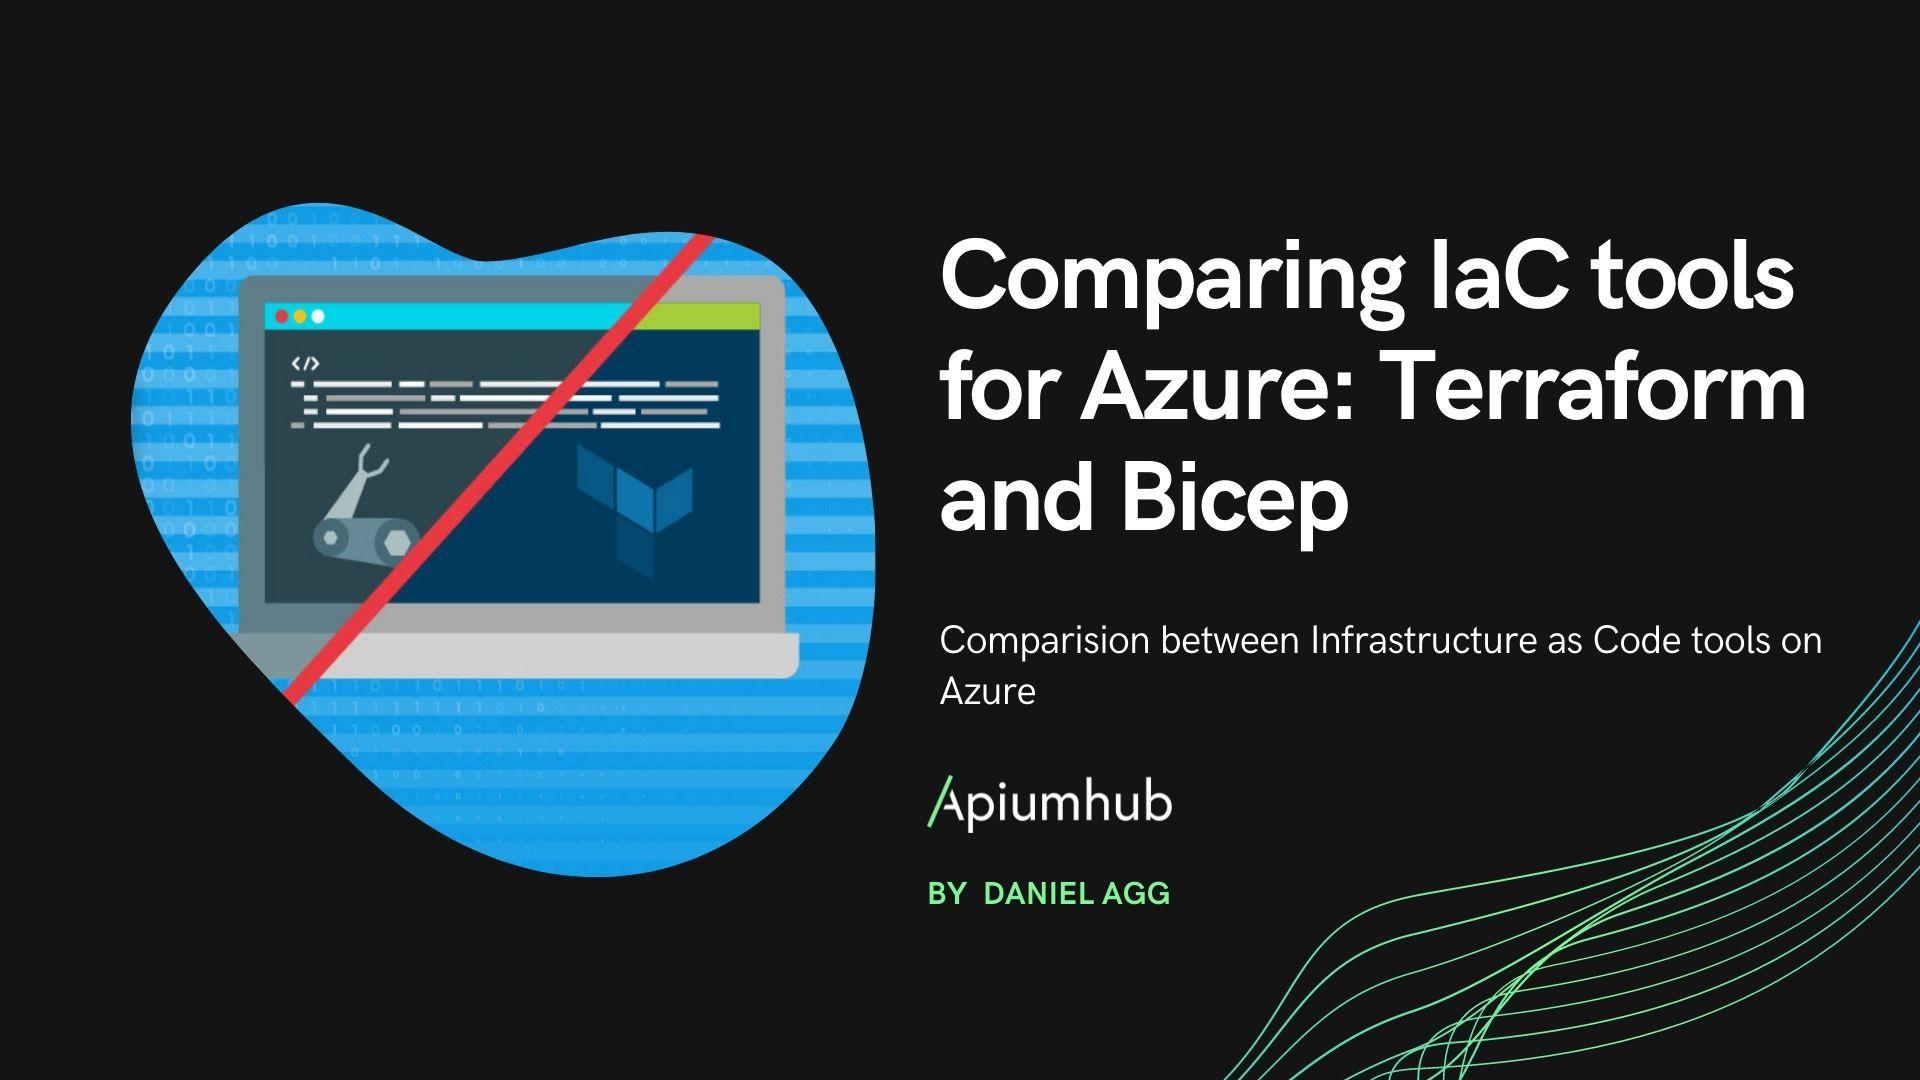 Comparing IaC tools for Azure: Terraform and Bicep